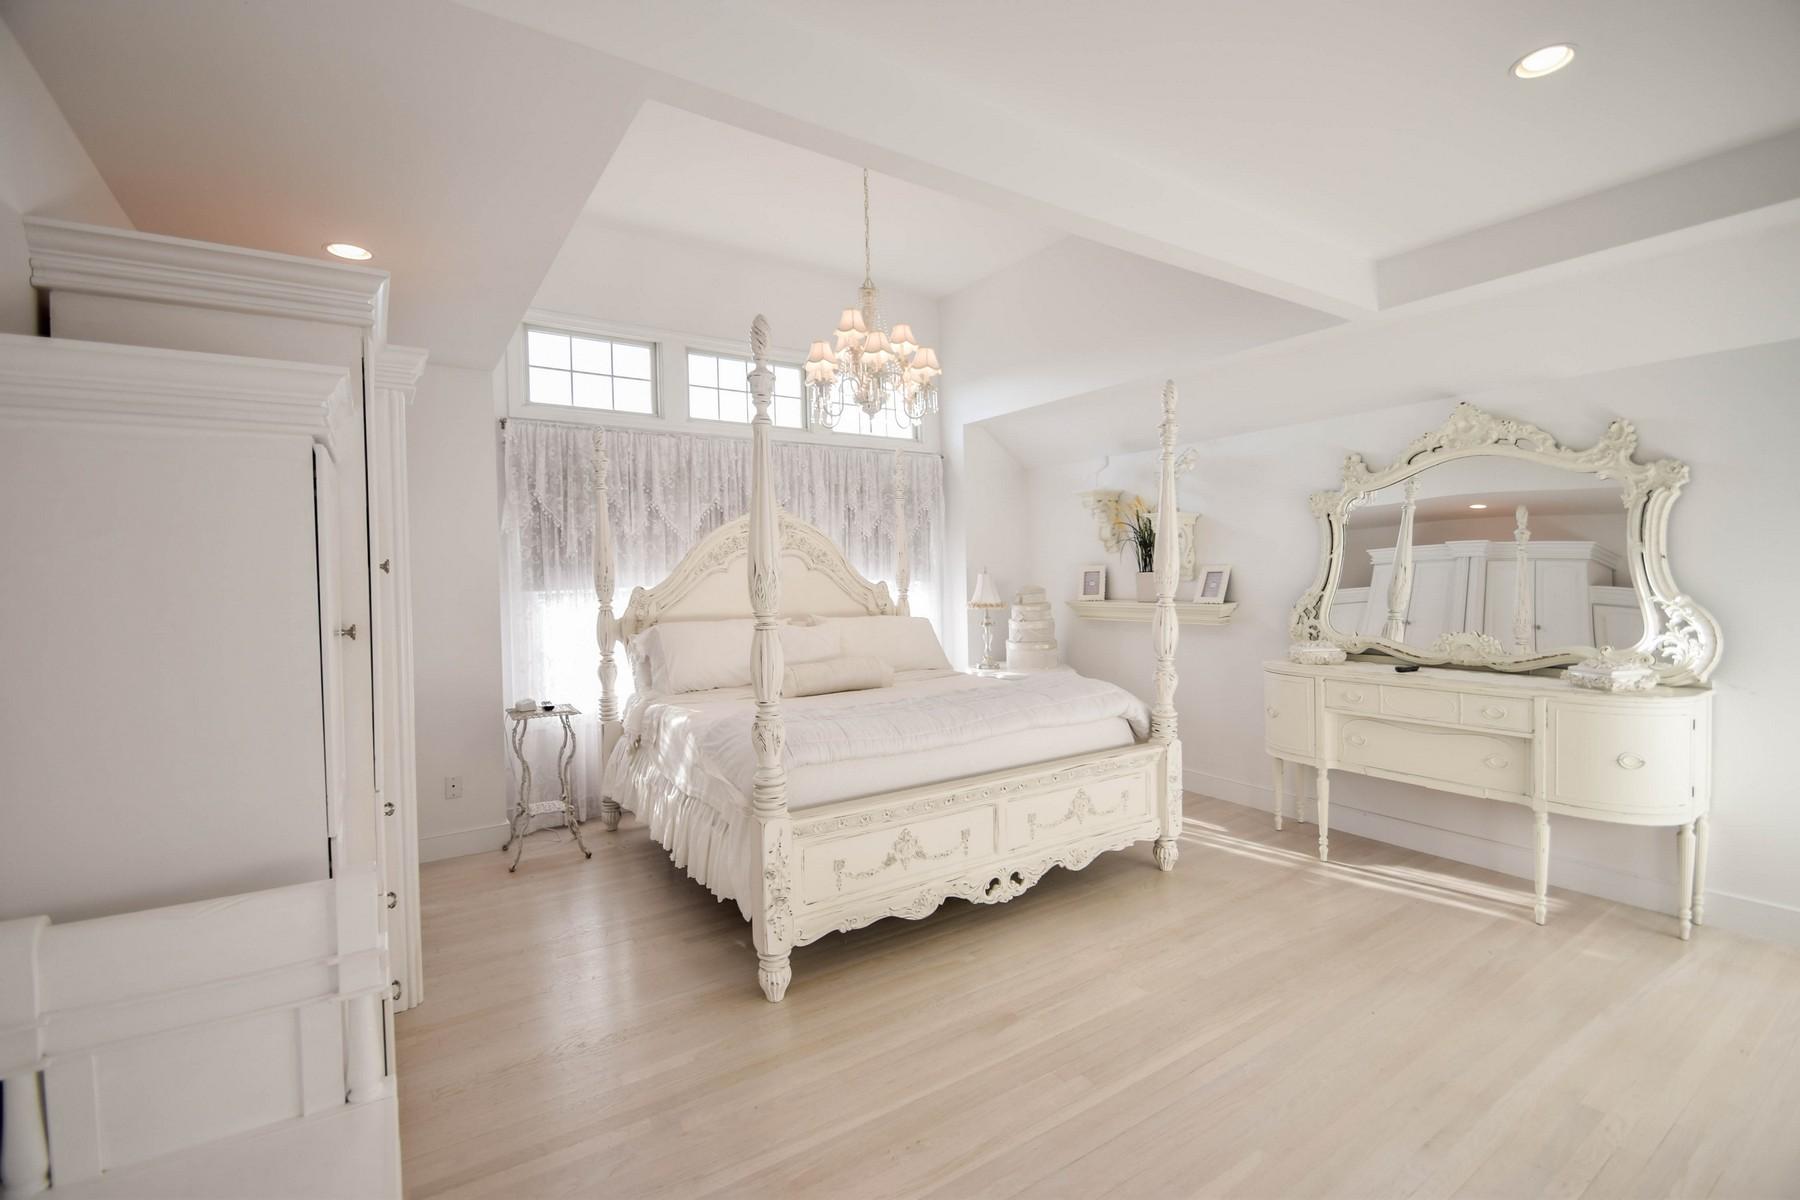 Additional photo for property listing at  Margate, Нью-Джерси 08402 Соединенные Штаты